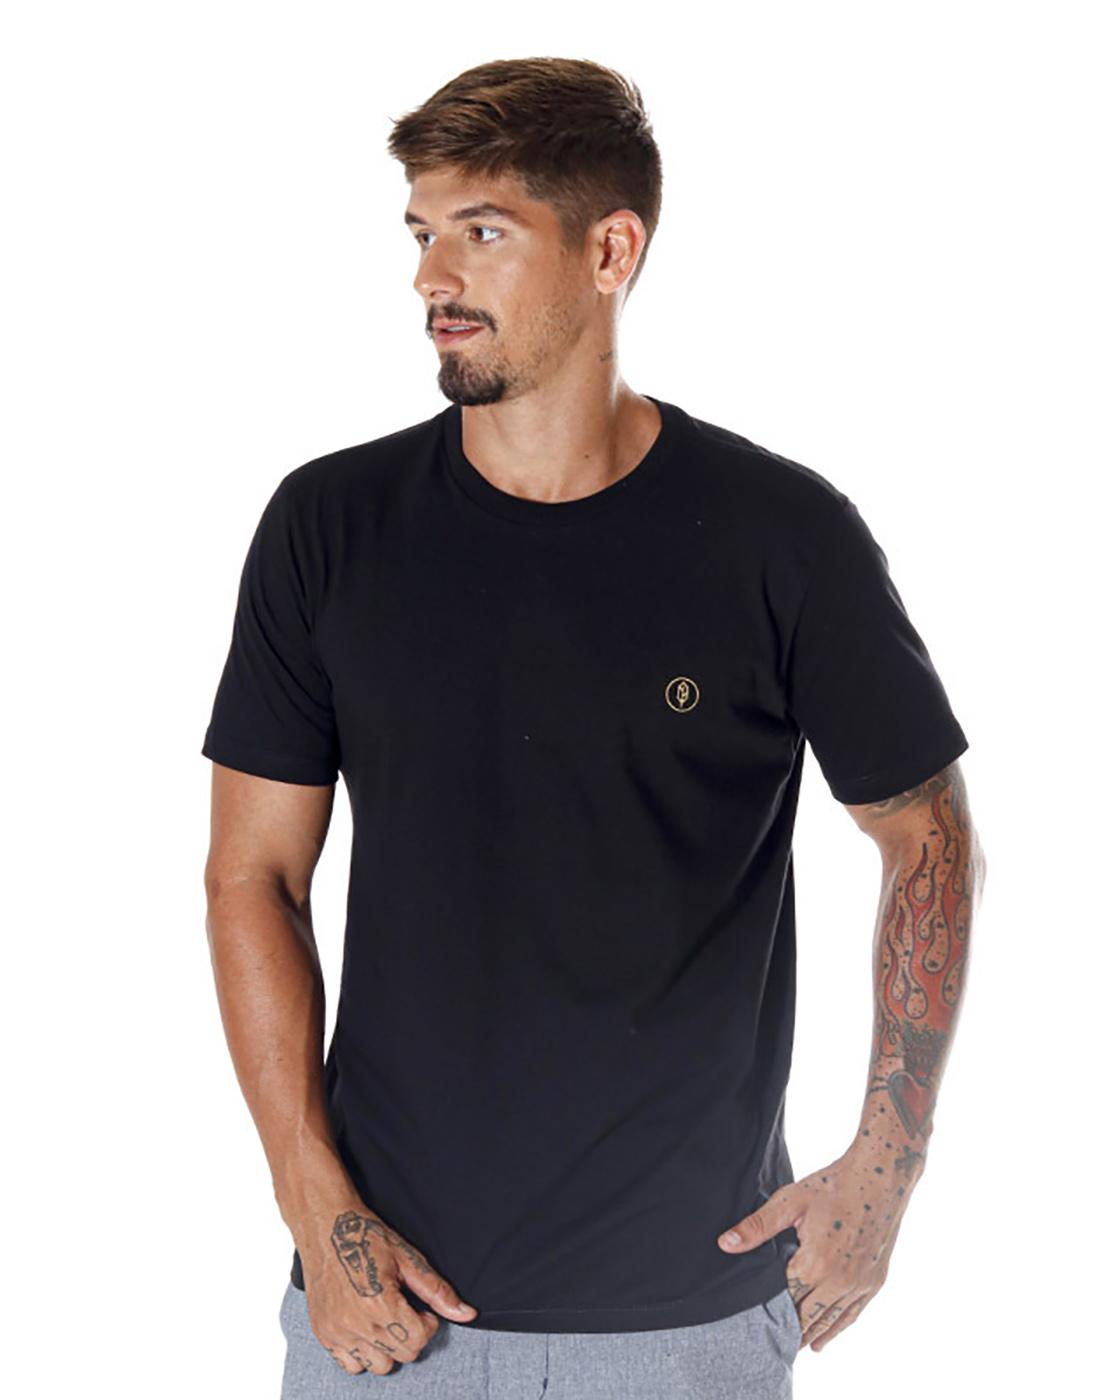 Camiseta Estampada Orbital Preto Pena